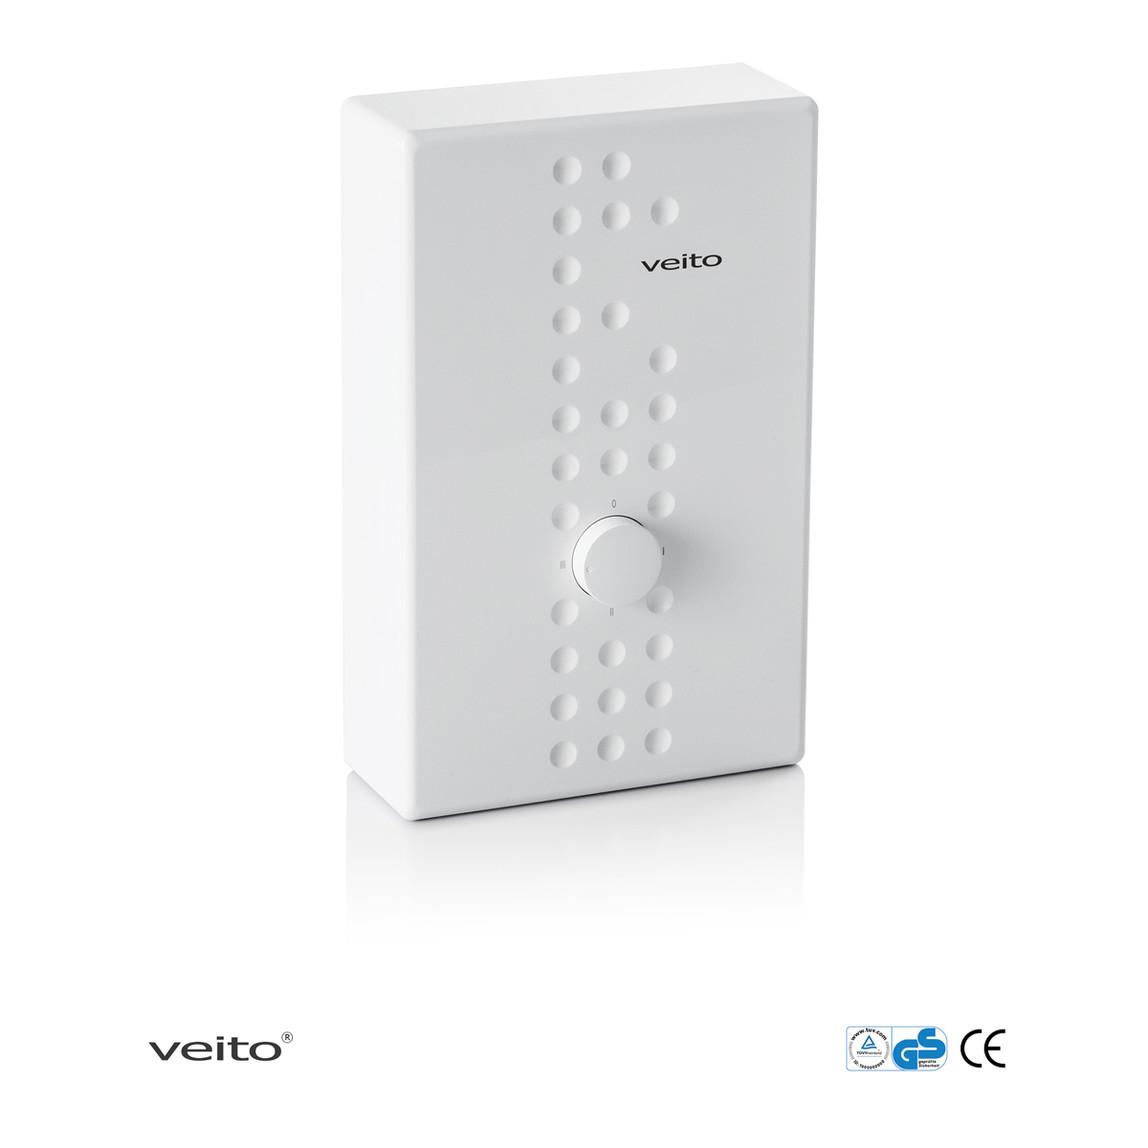 Veito 7500 W Merkezi Sistem Elektrikli Ani Su Isıtıcı